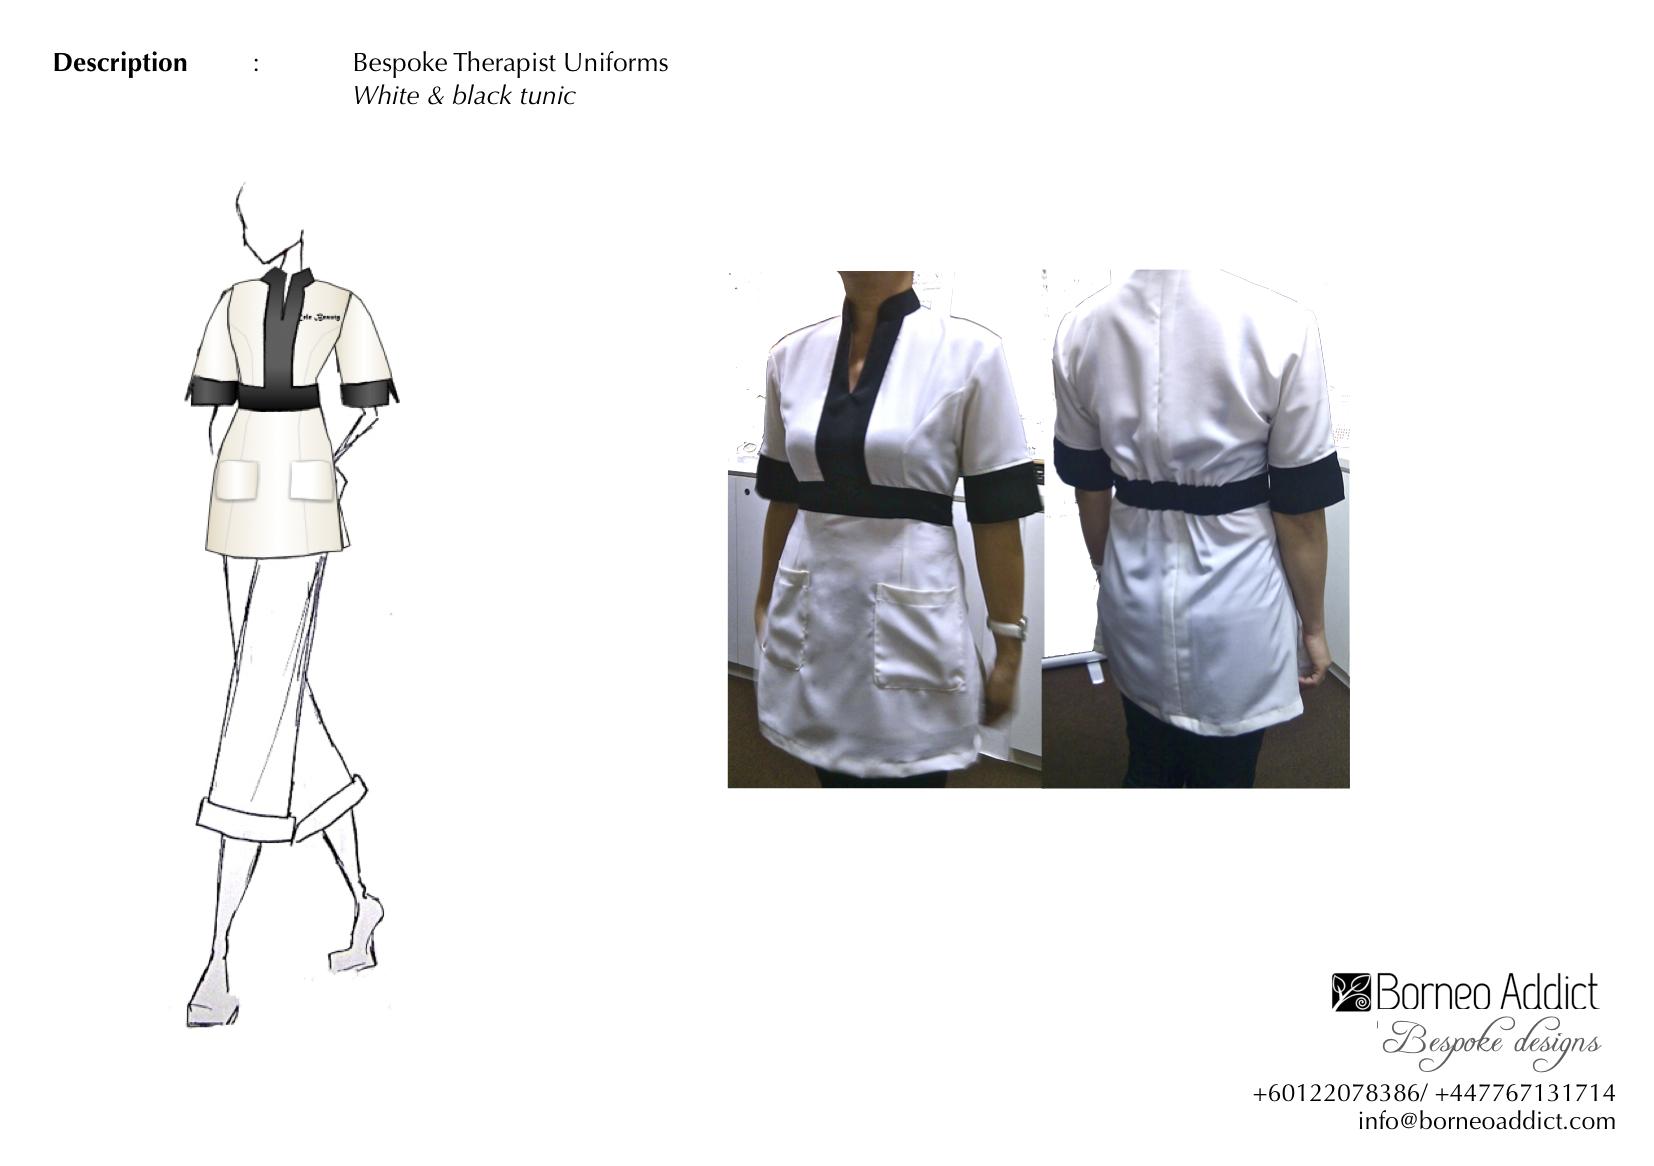 Uniforms for Uniform spa malaysia